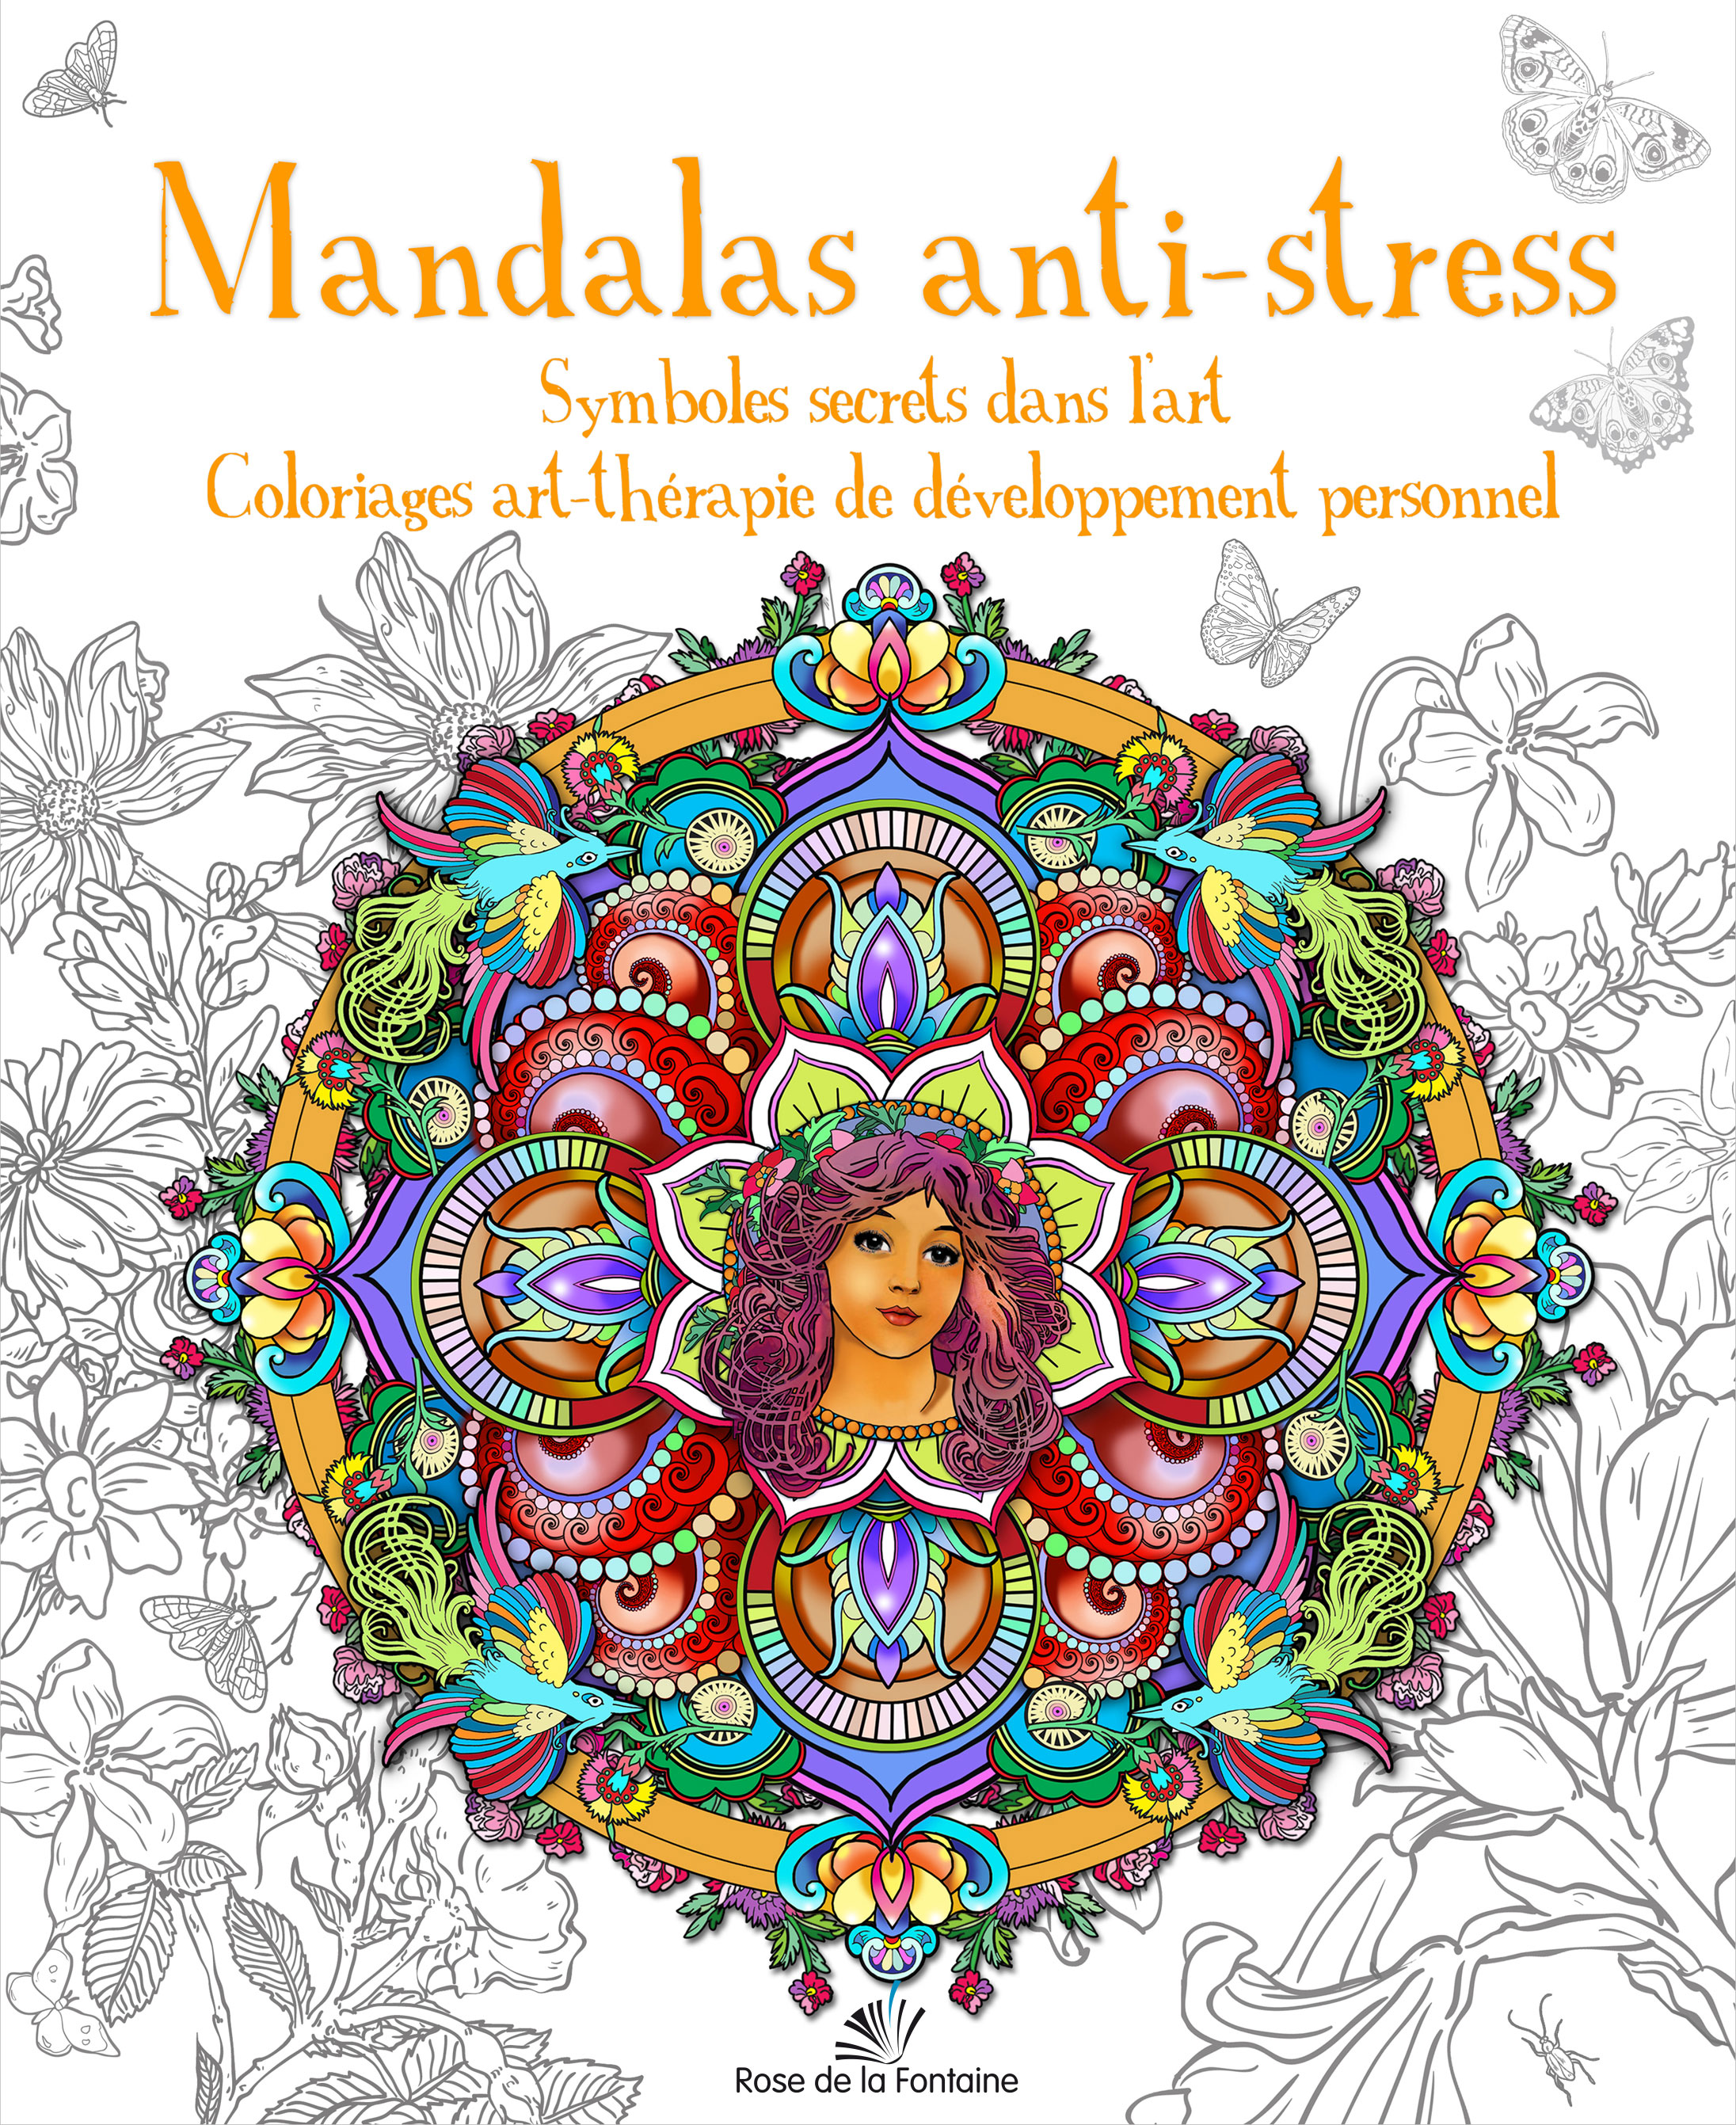 Mandalas anti stress symboles secrets dans l art coloriages art th rapie de d veloppement - Dessin anti stress mandala ...